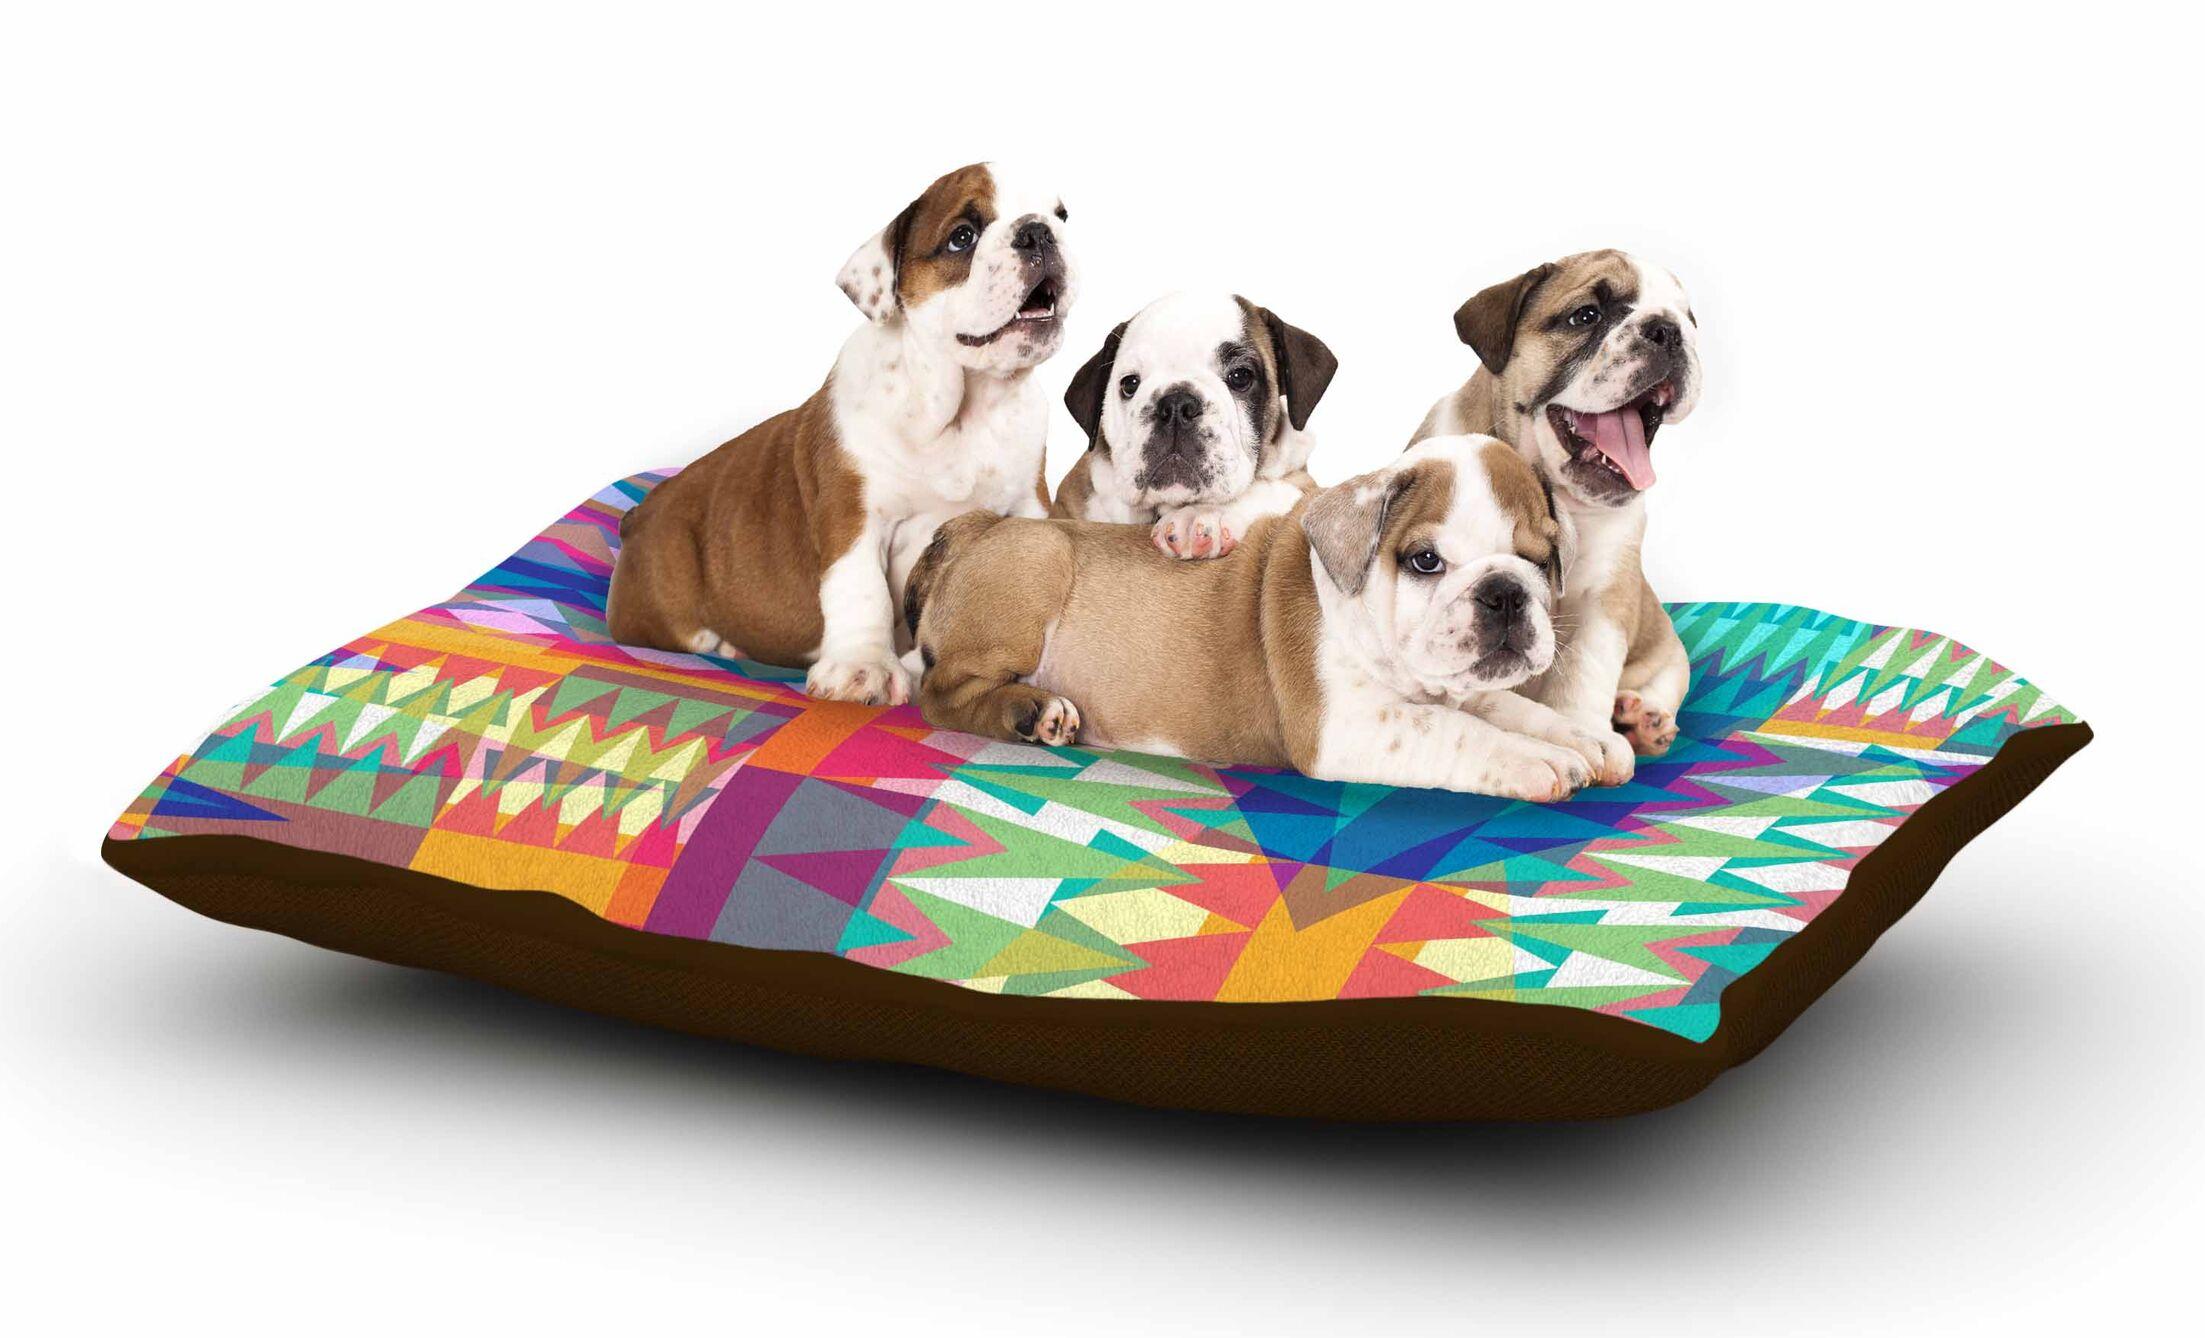 Miranda Mol 'Triangle Quilt' Geometric Dog Pillow with Fleece Cozy Top